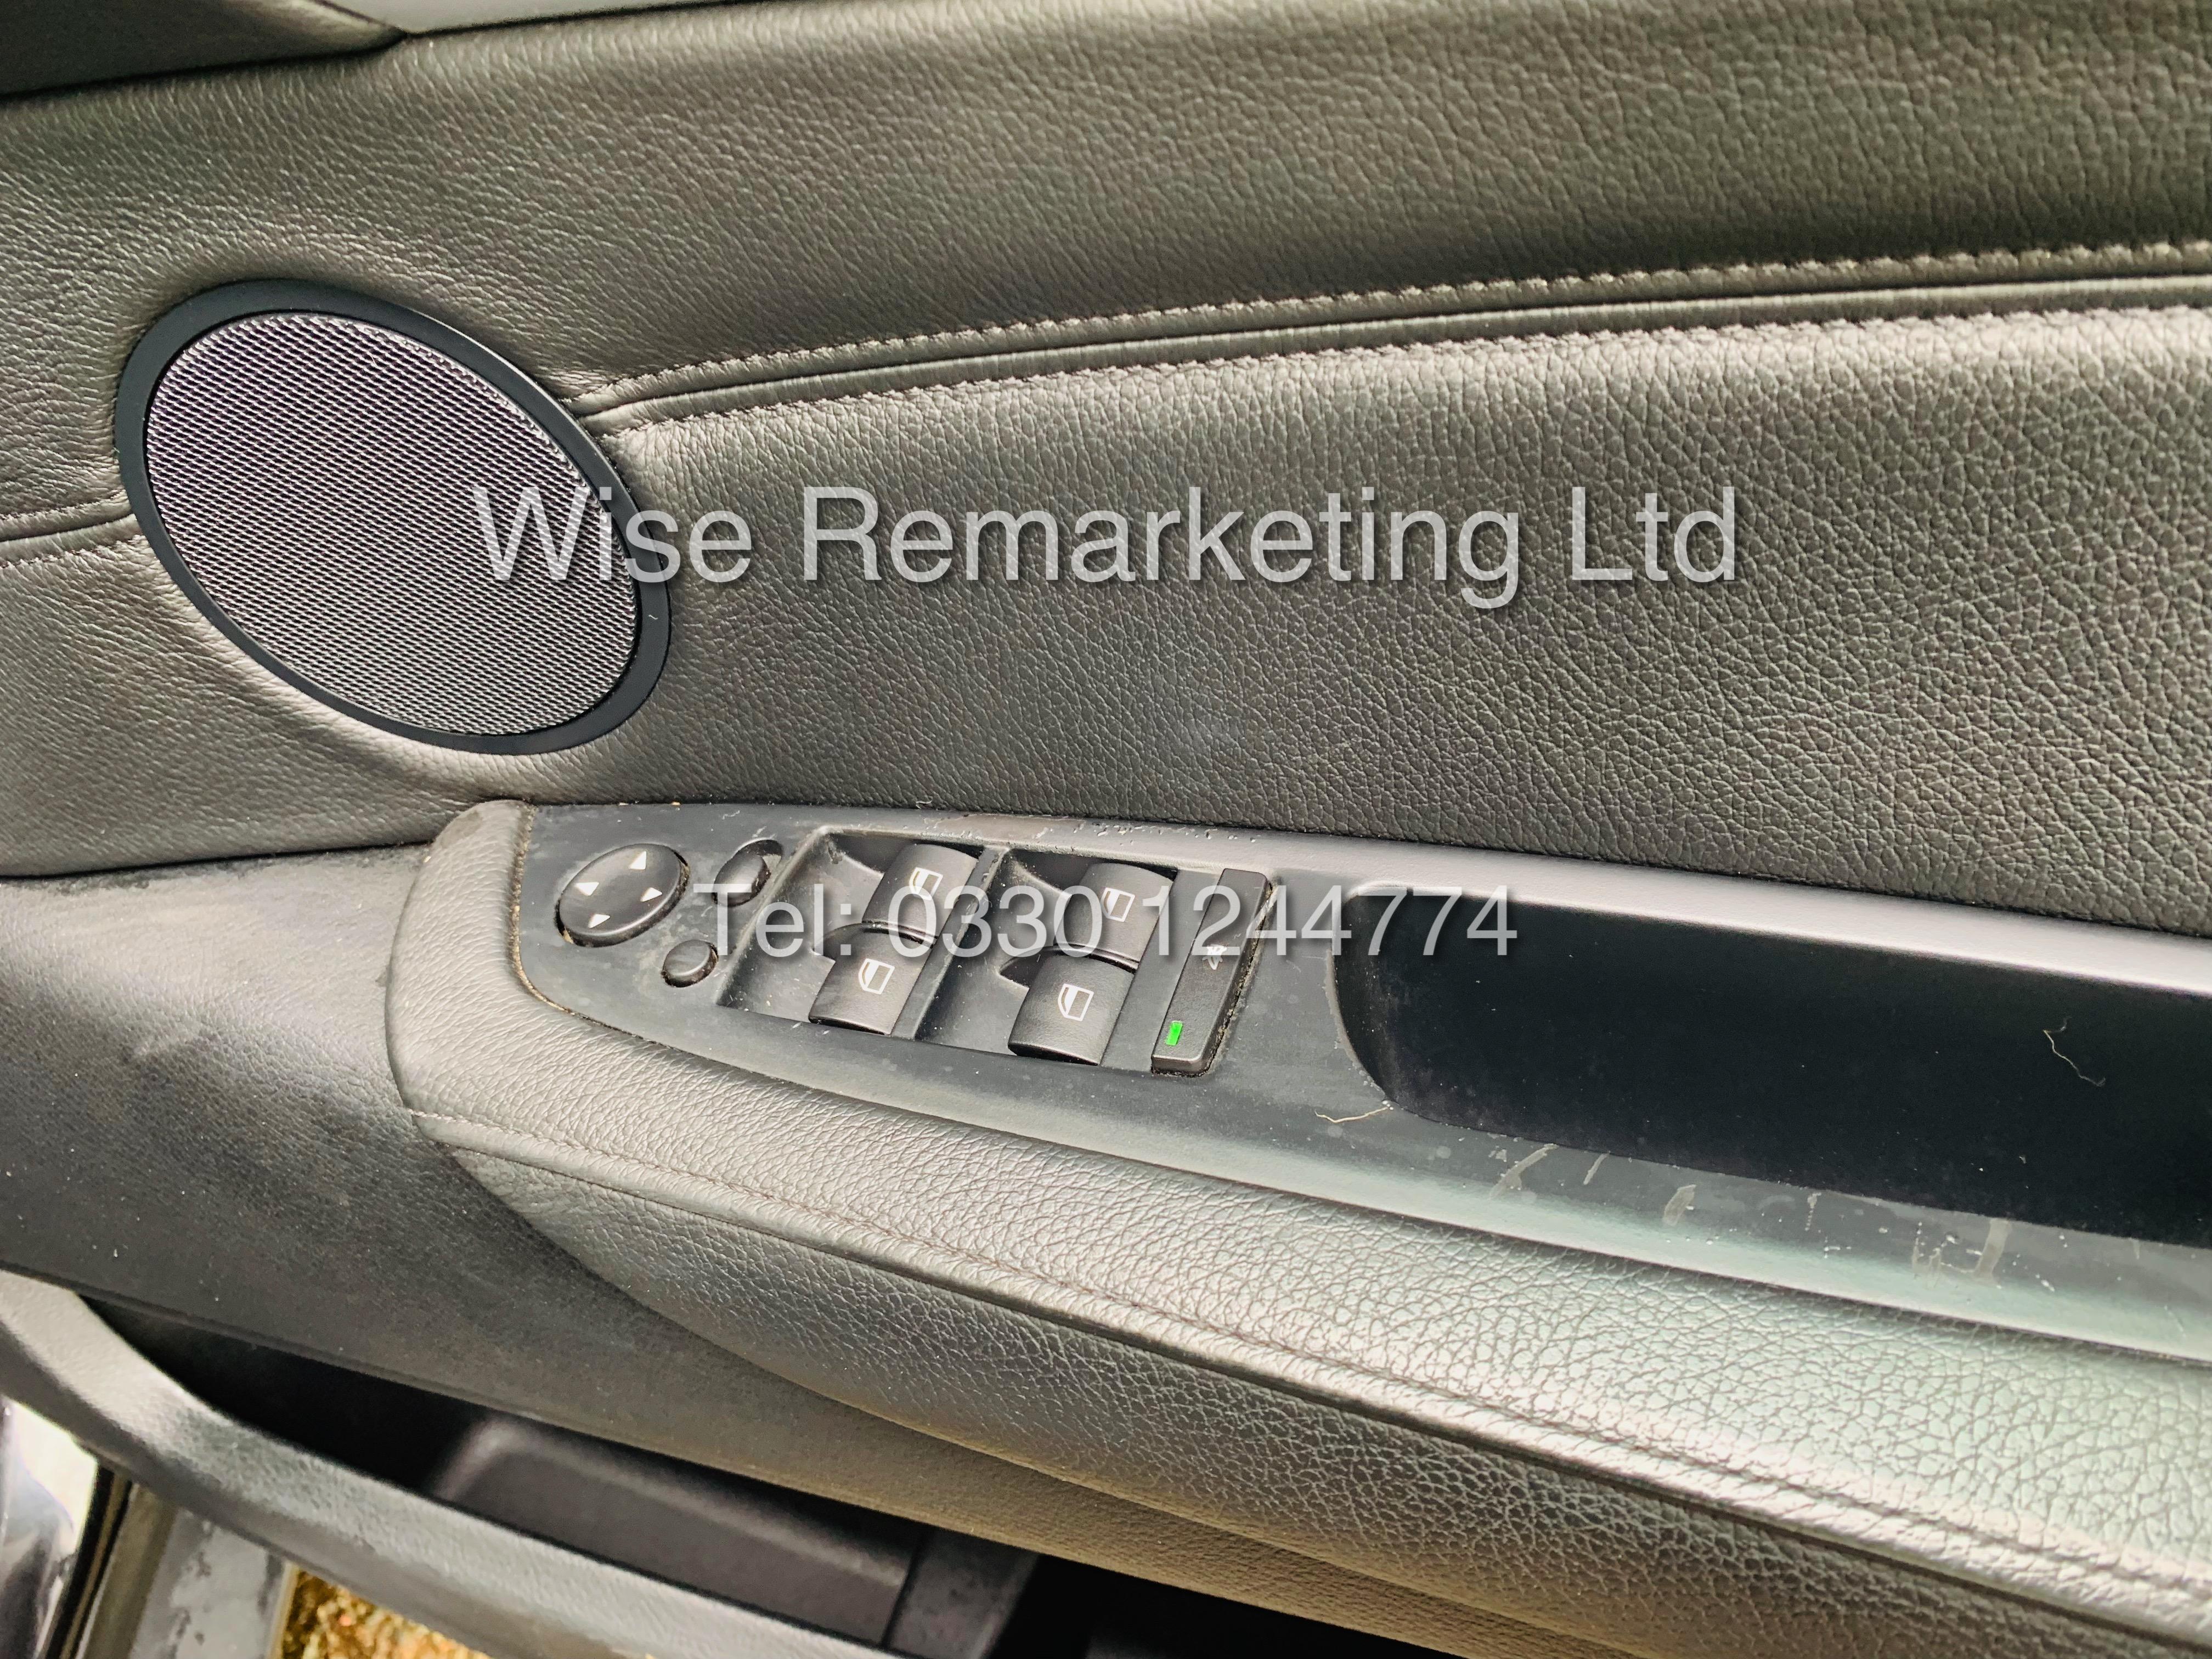 BMW X6 XDRIVE 35D AUTO (2009 SPEC) *1 PREVIOUS OWNER* PARKING AID - SAT NAV - FSH - Image 16 of 25